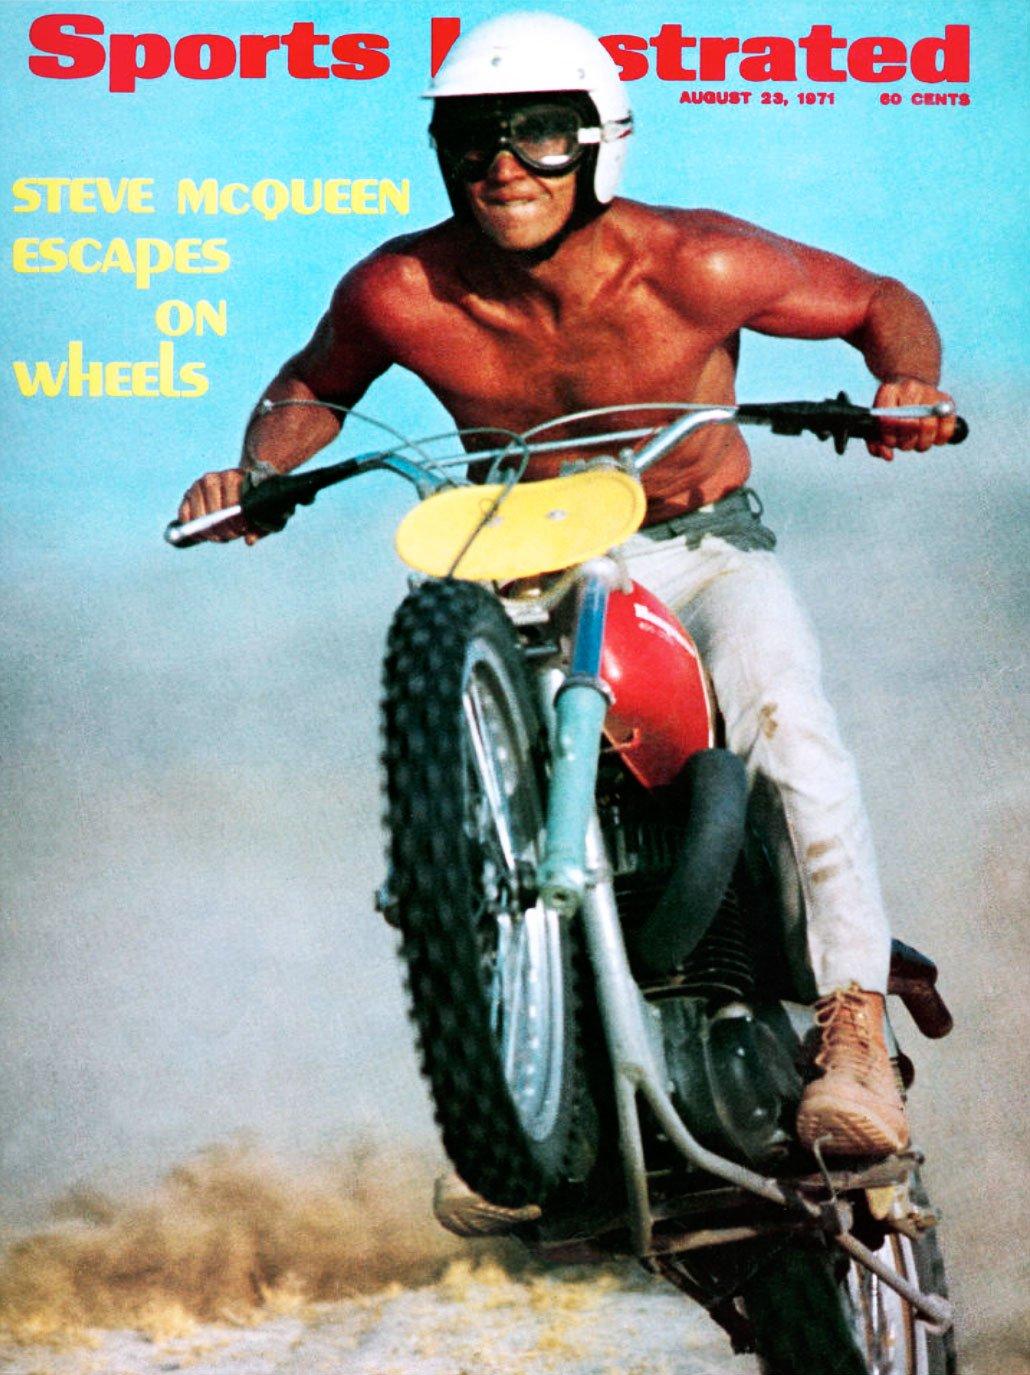 Steve McQueen Rolex Sports Illustrated Motorcycle Steve McQueen   Sports Illustrated